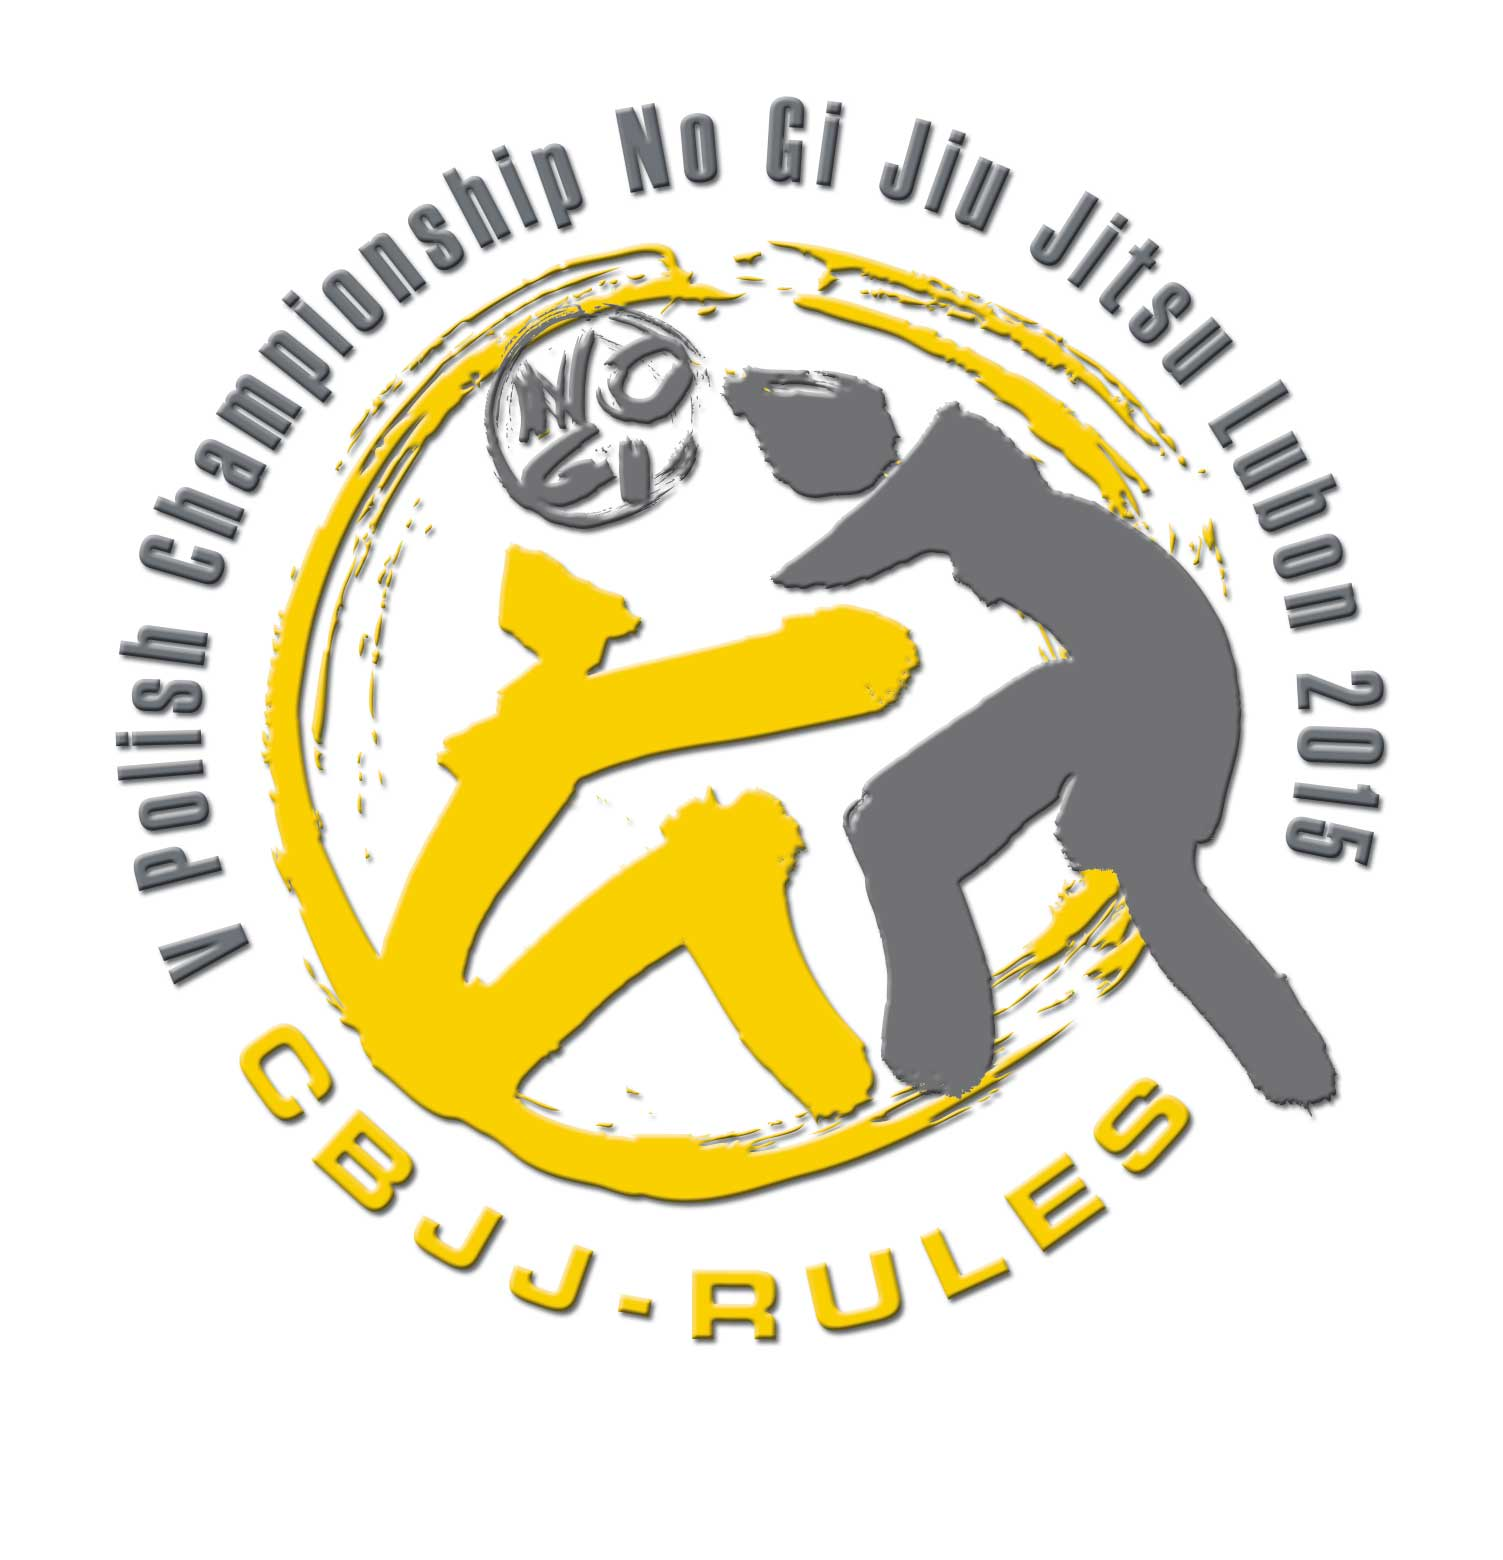 5th Polish Championship in No Gi Jiu-Jitsu, 21-22 February 2015